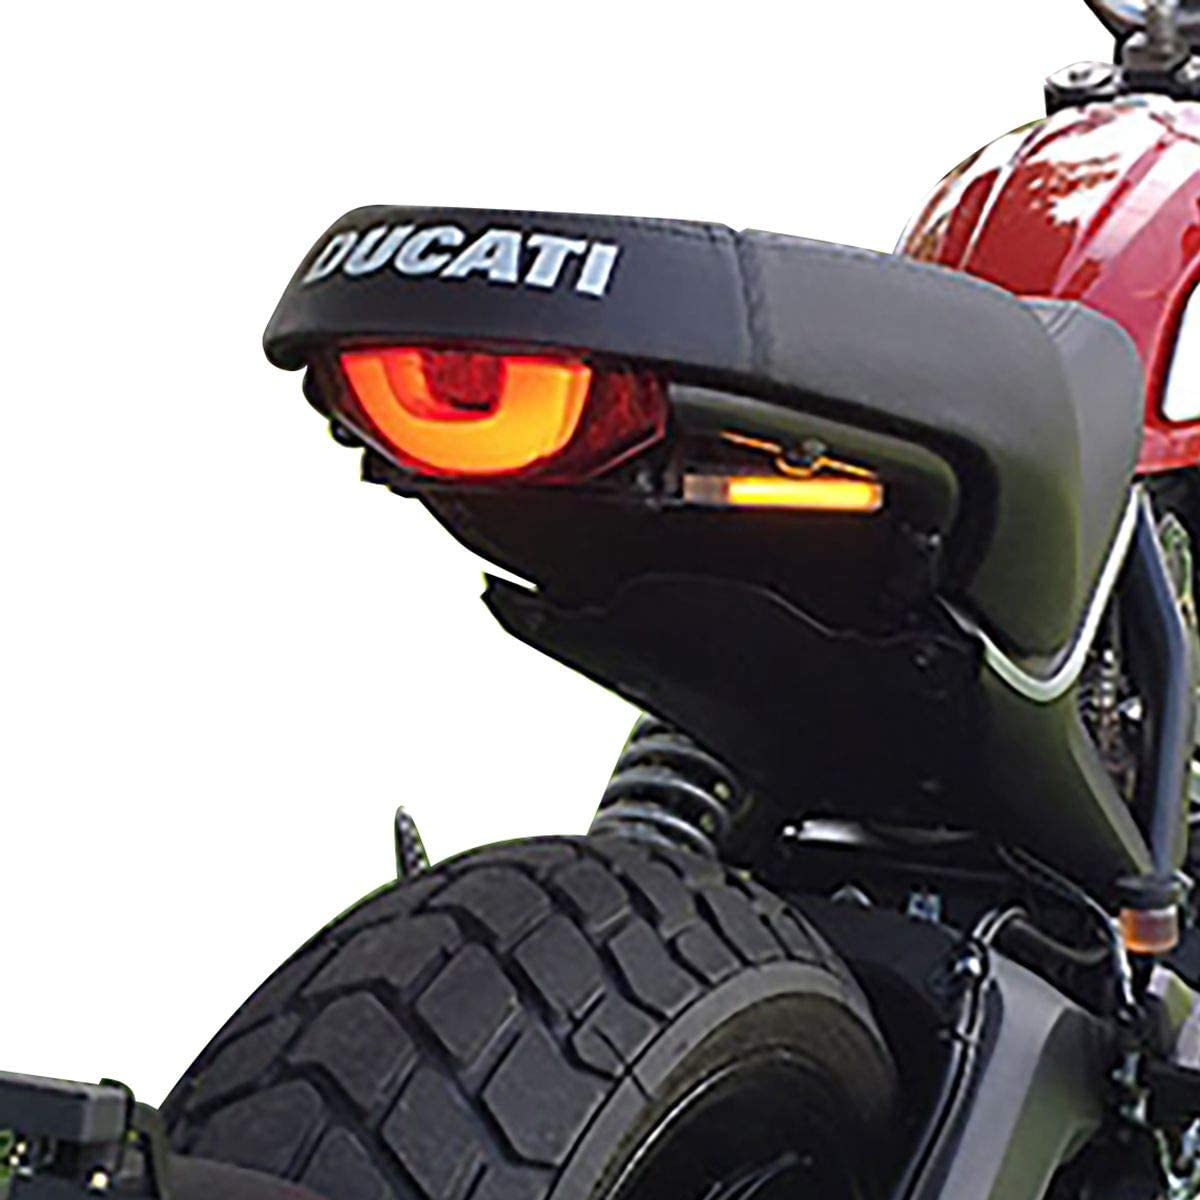 Ducati Scrambler Fender Eliminator Kit (Plate Light Bracket) - New Rage Cycles